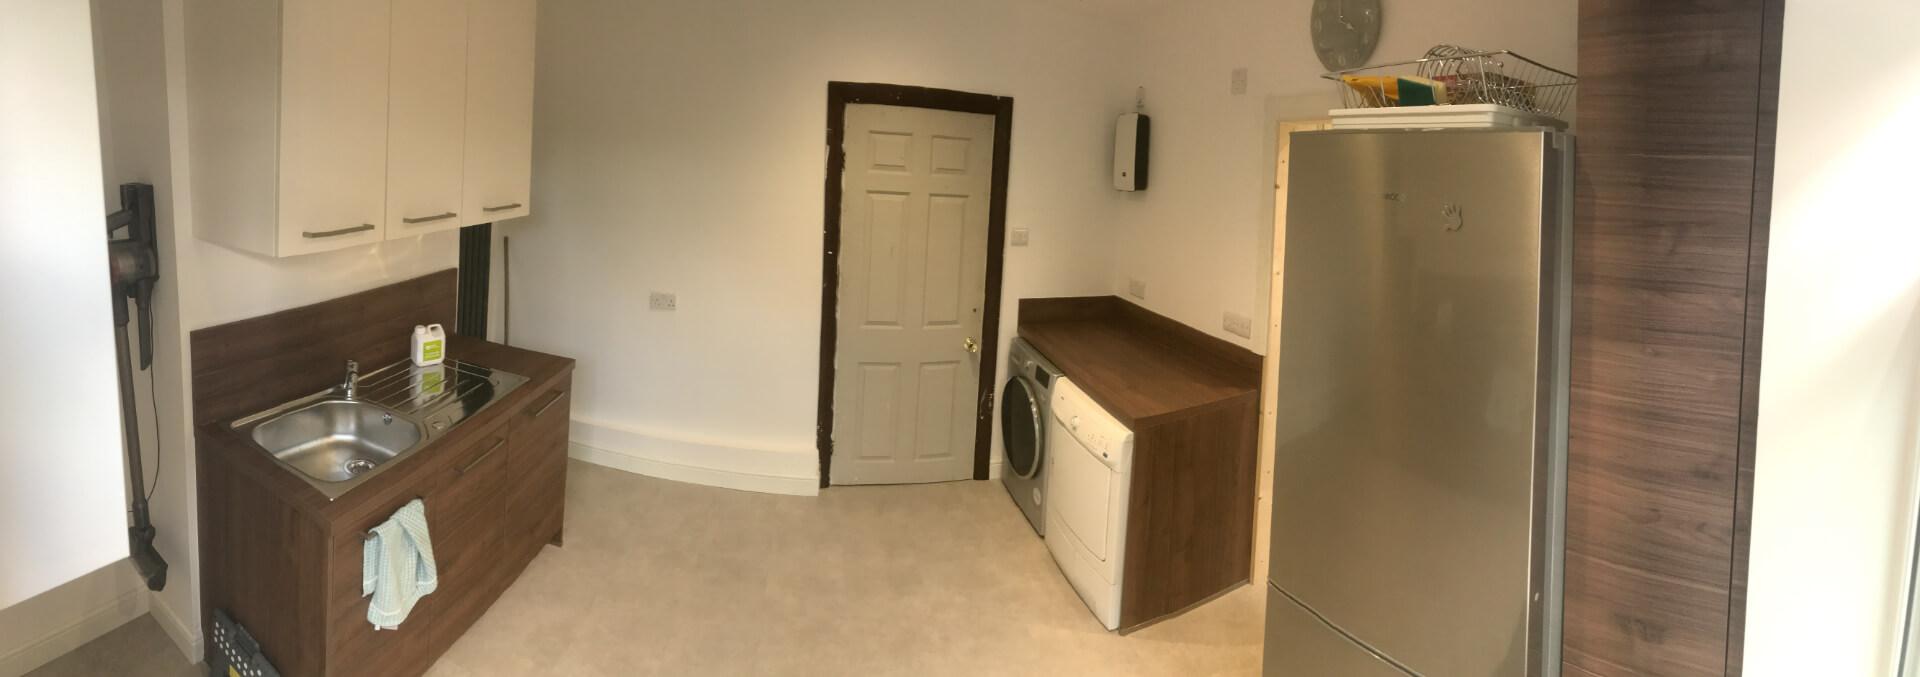 New Utility Room